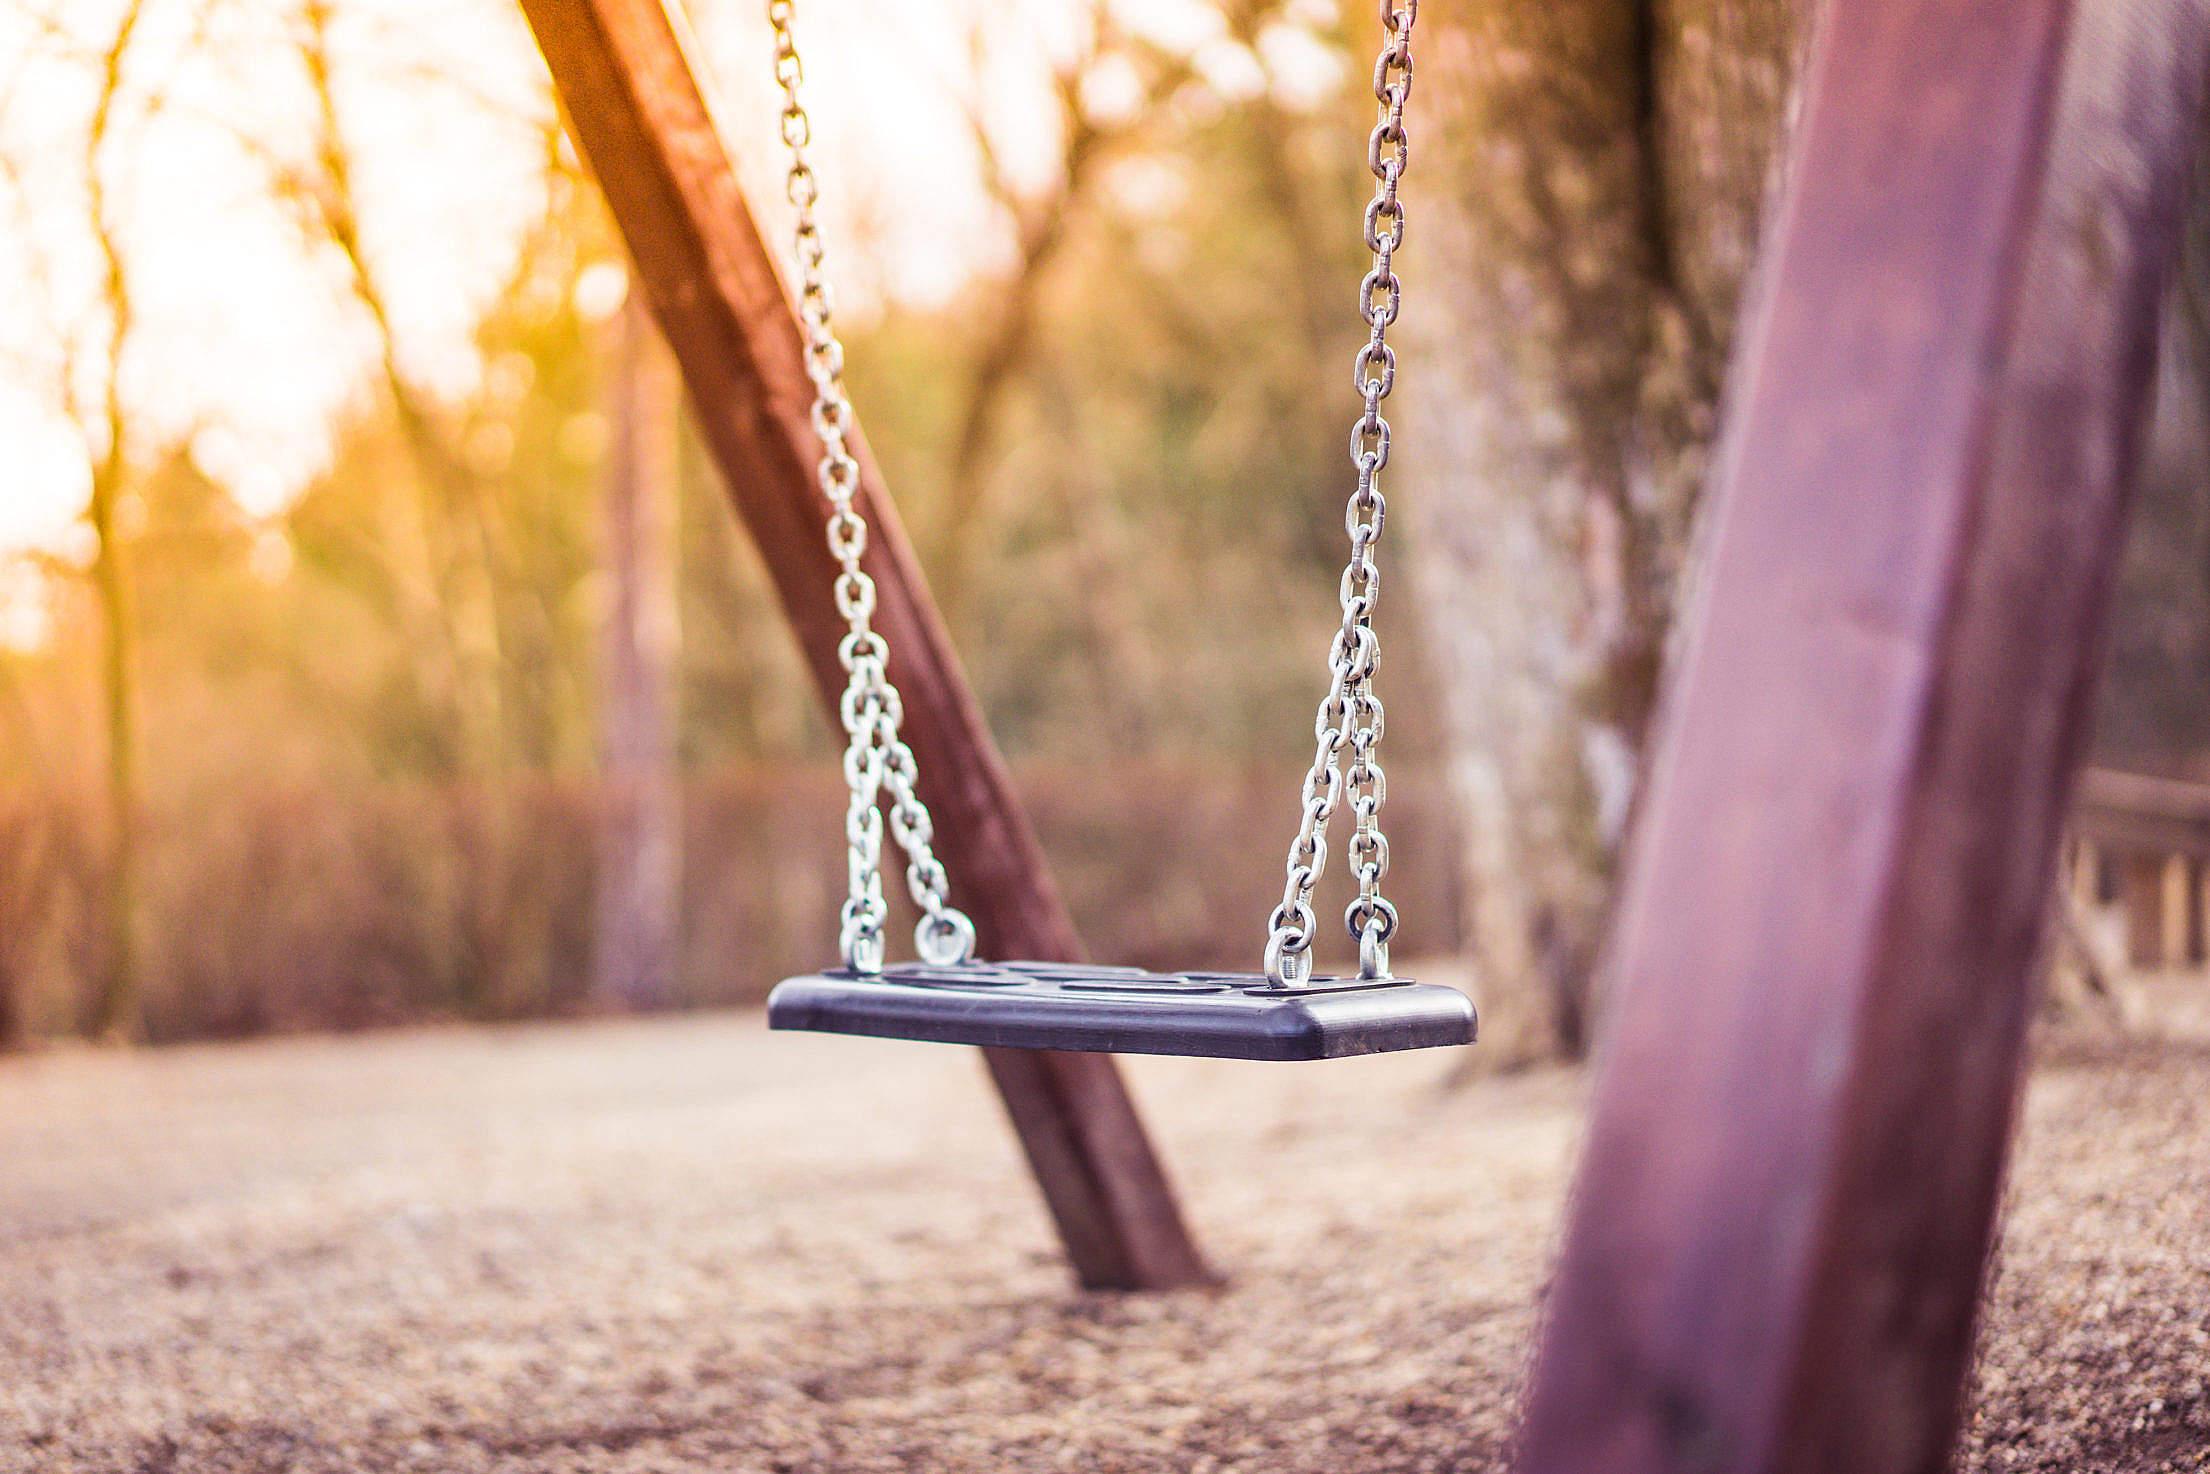 swing-for-kids-in-city-park-playground-2_free_stock_photos_picjumbo_DSC03309-2210x1474